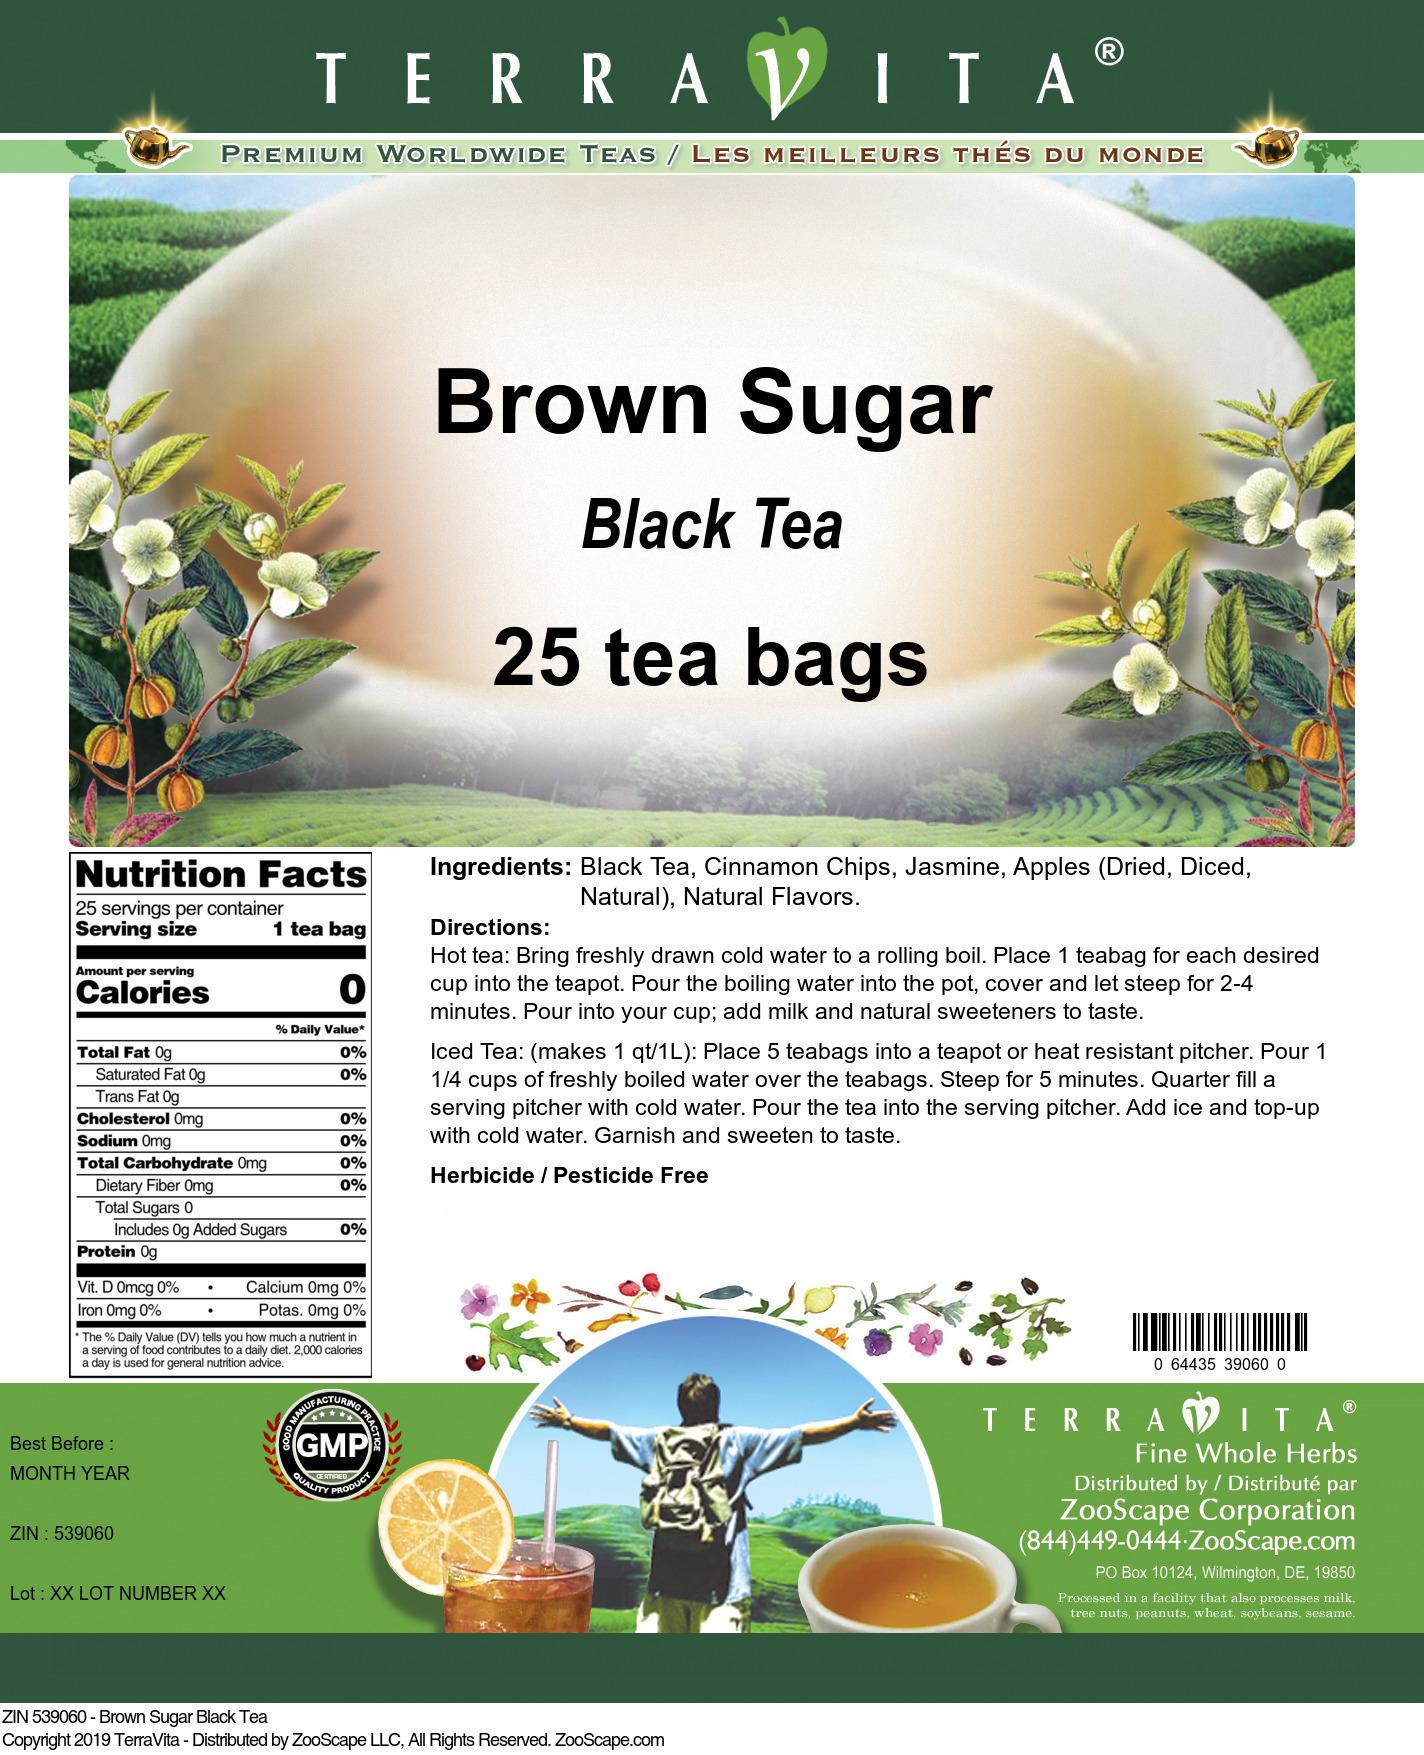 Brown Sugar Black Tea